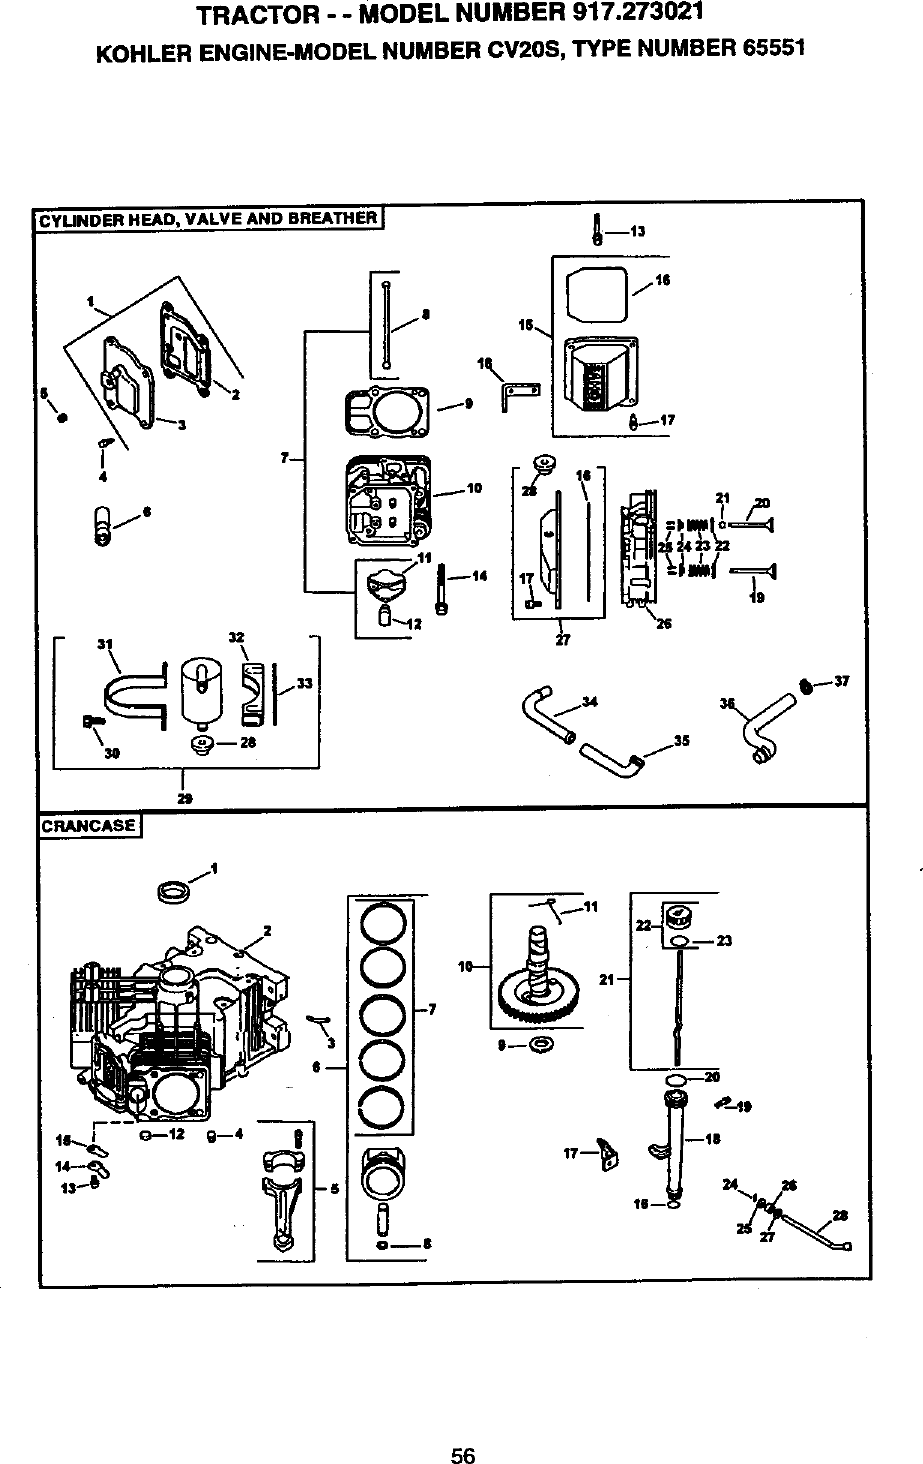 Kohler Cv20s Wiring Harness. . Wiring Diagram on